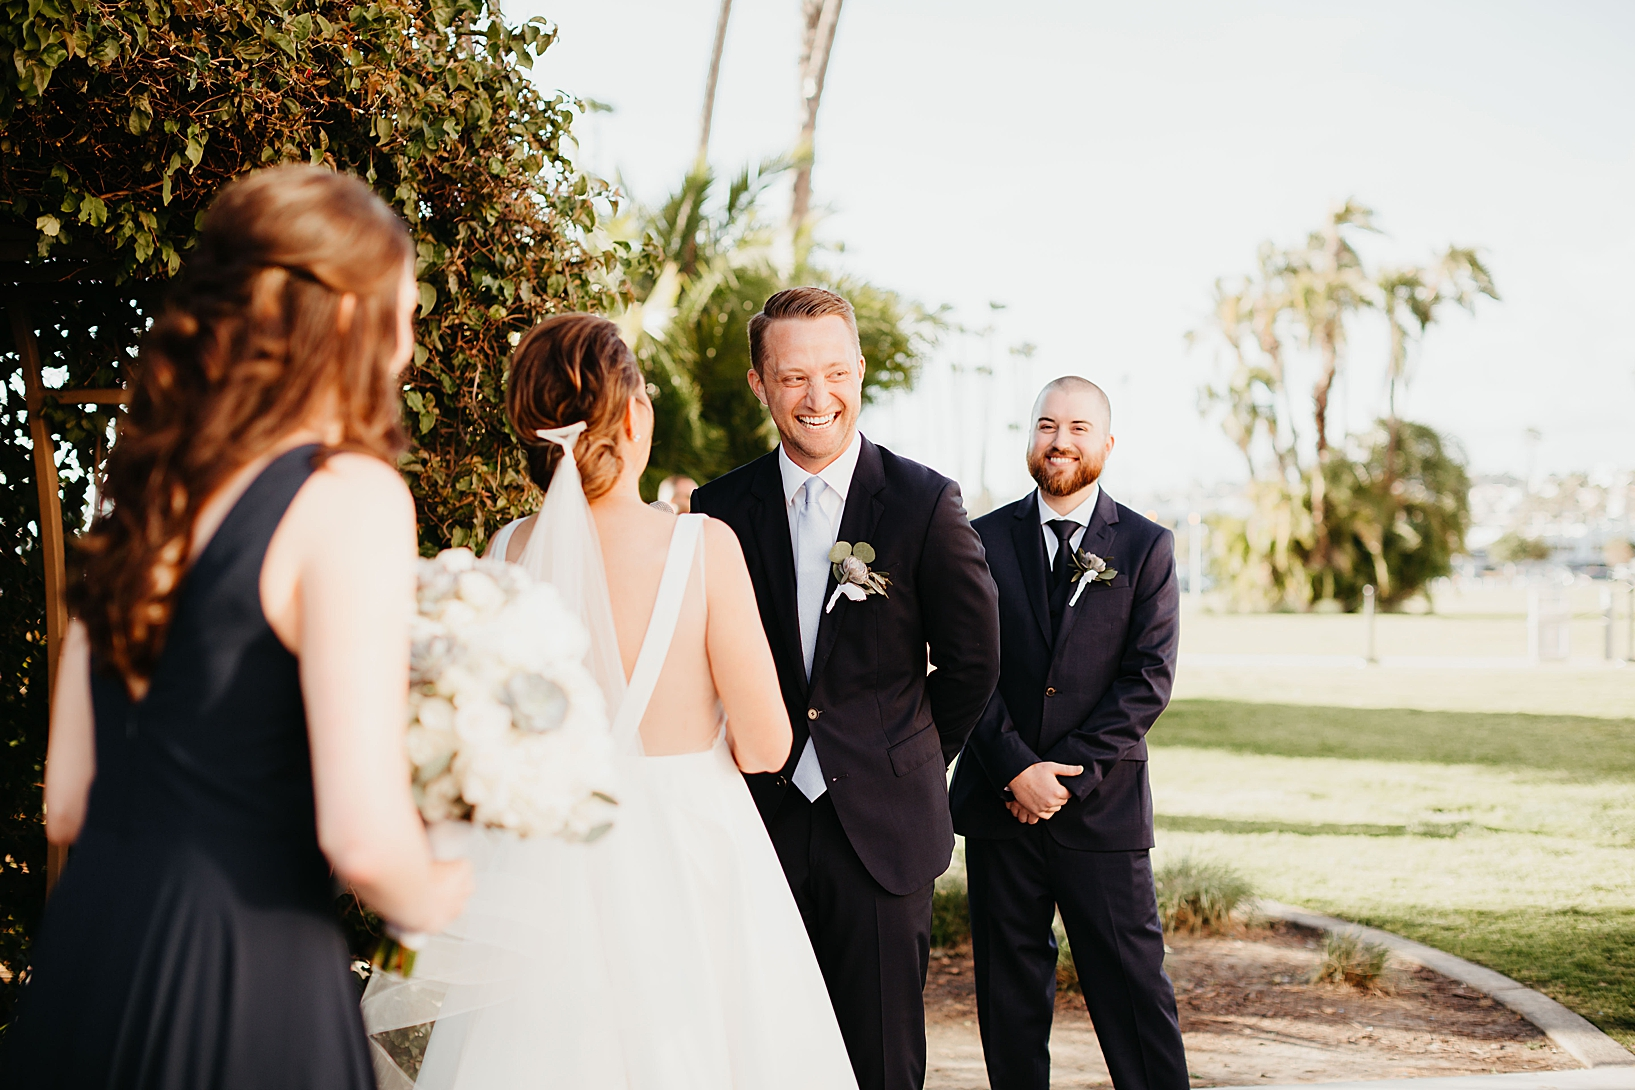 Herb-and-Wood-Wedding-41.jpg